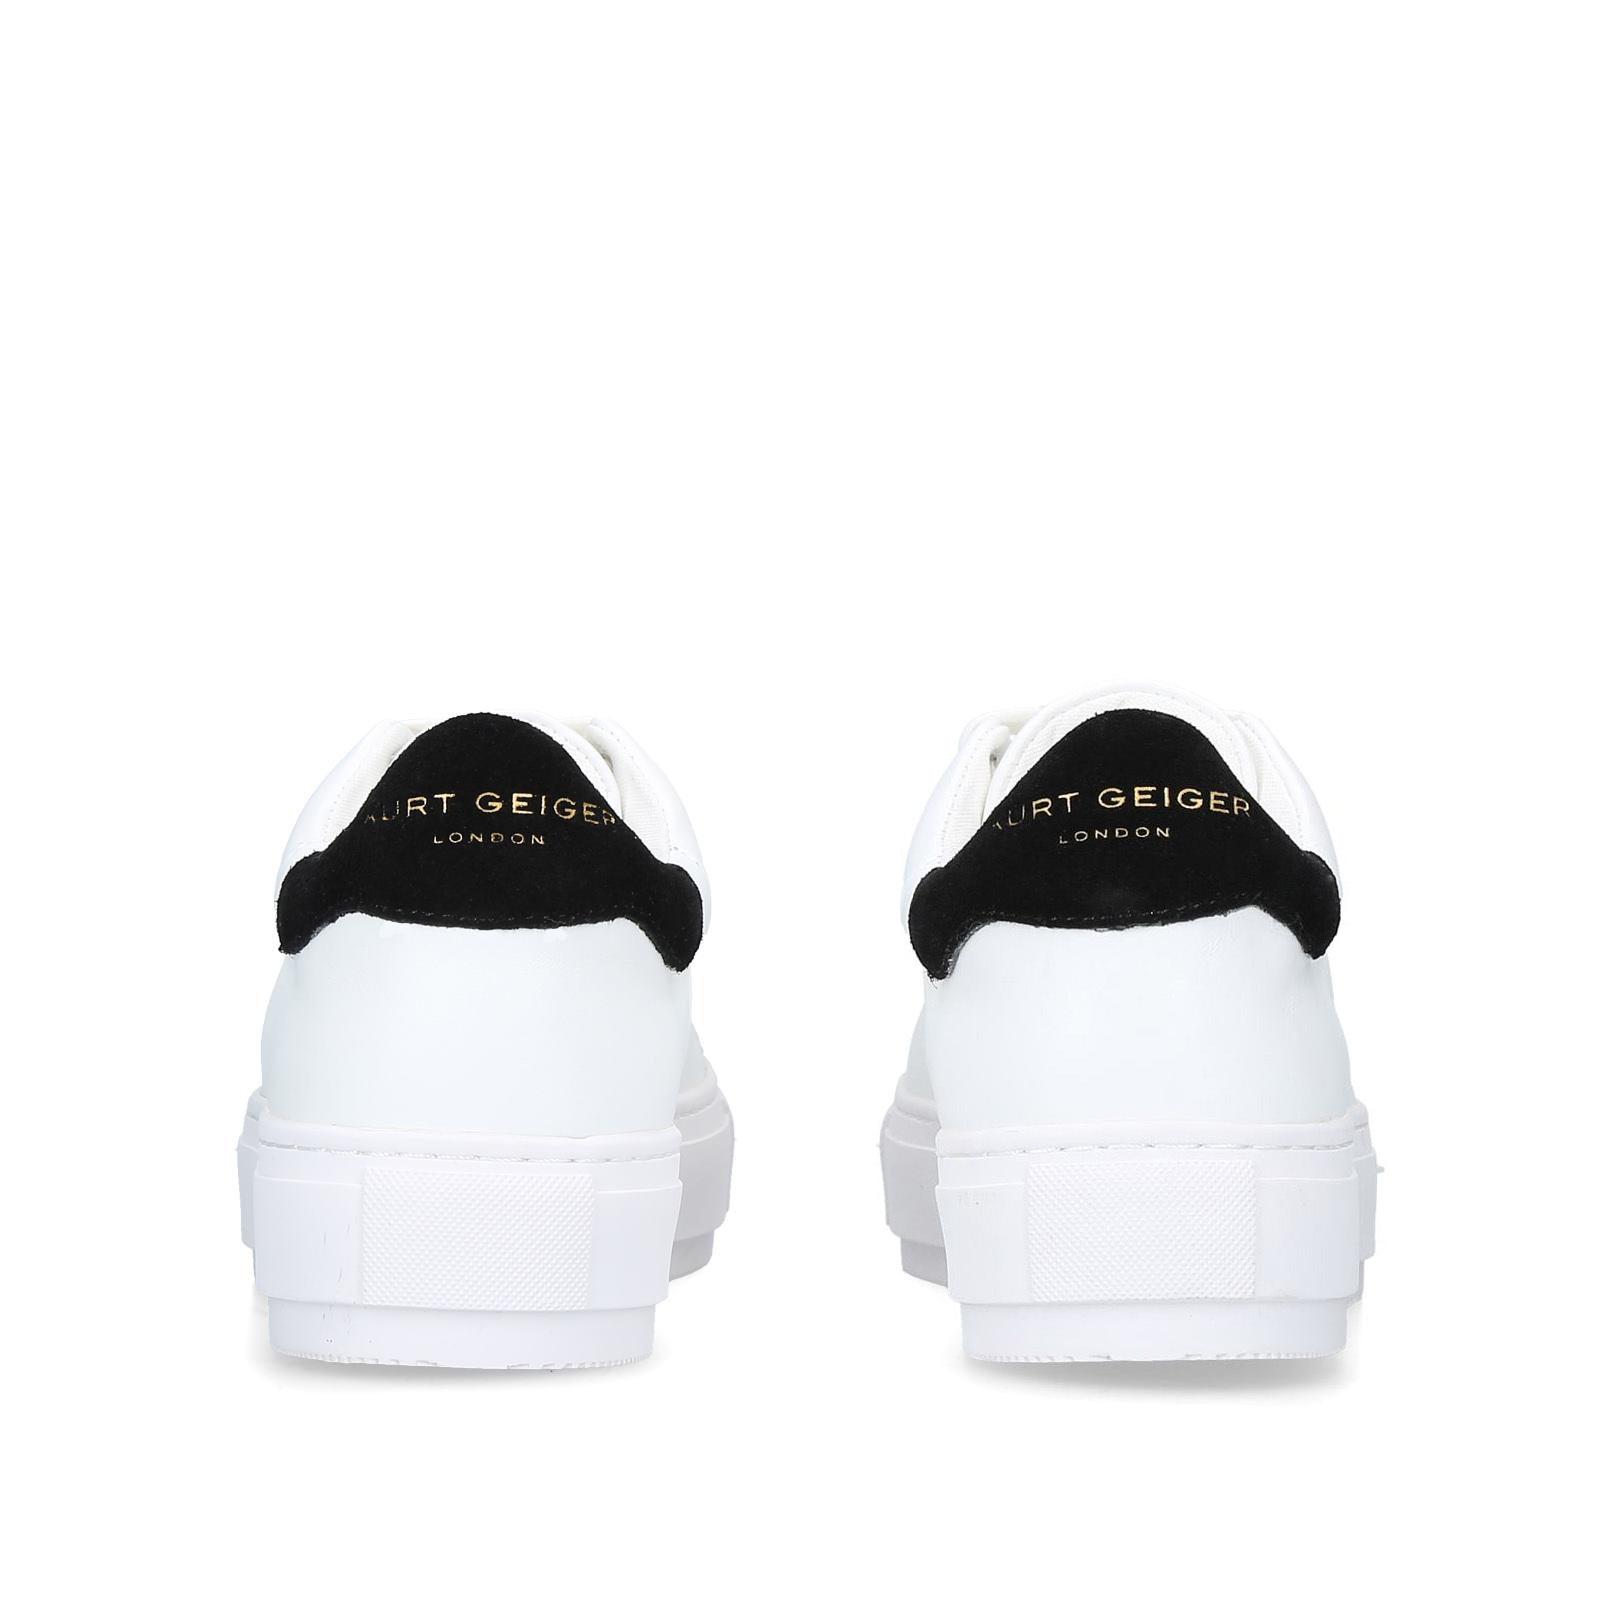 LANEY - KURT GEIGER LONDON Sneakers